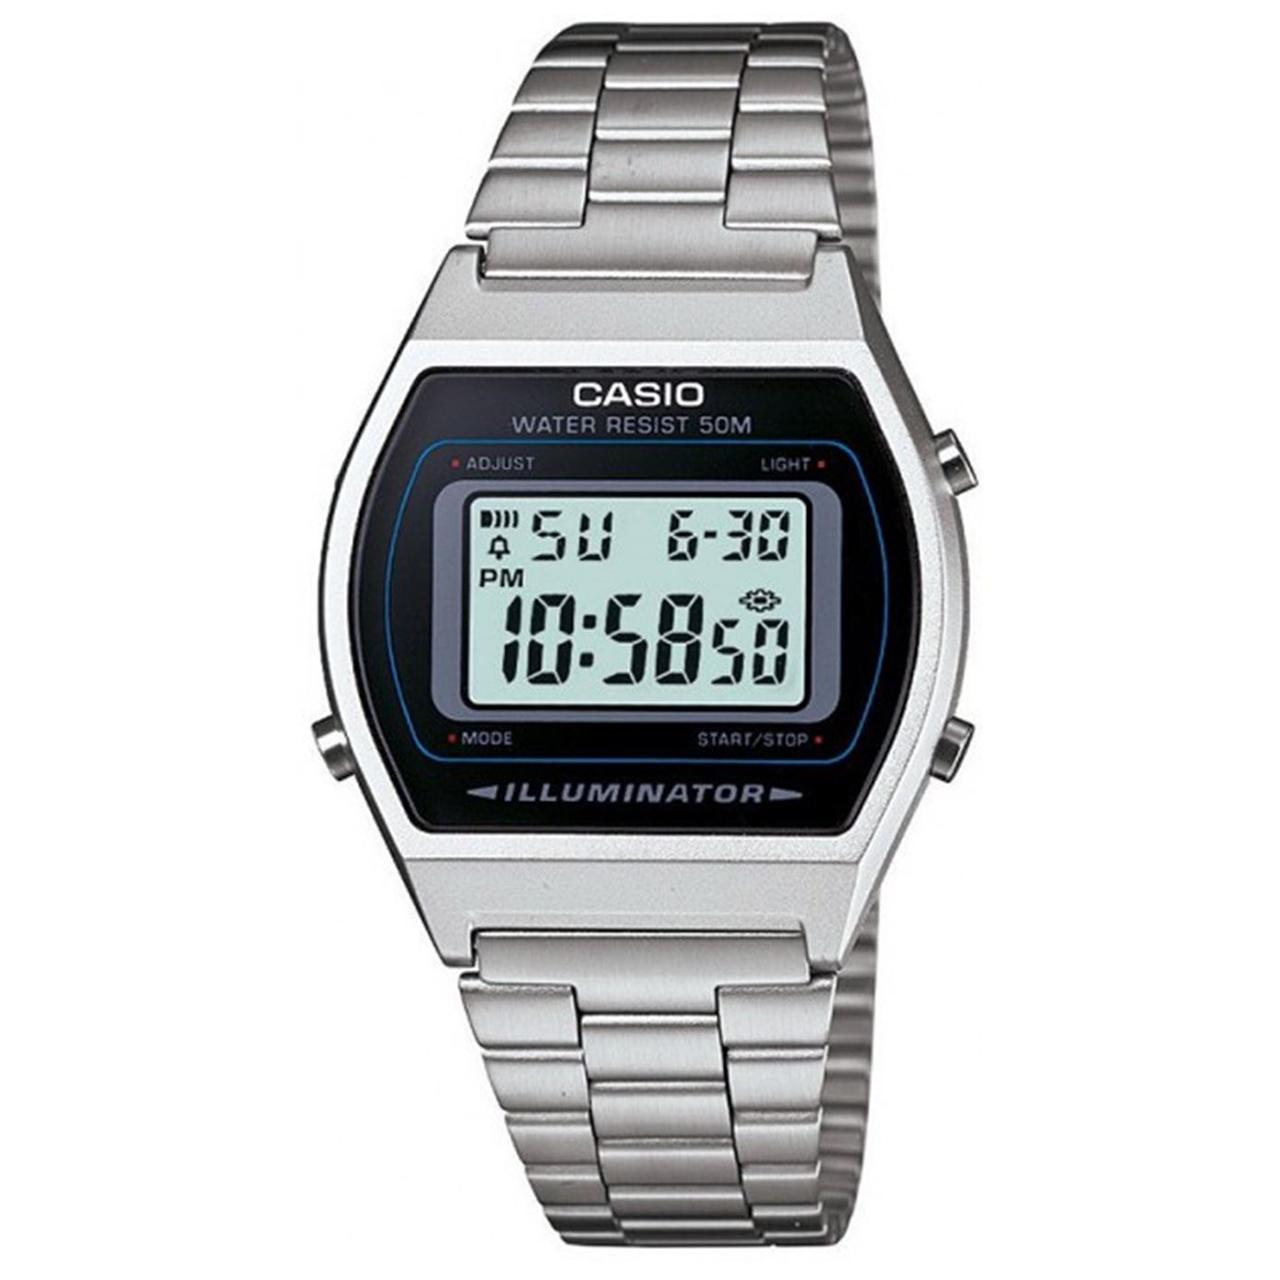 ساعت مچی دیجیتال مردانه کاسیو مدل B640WD-1AVDF